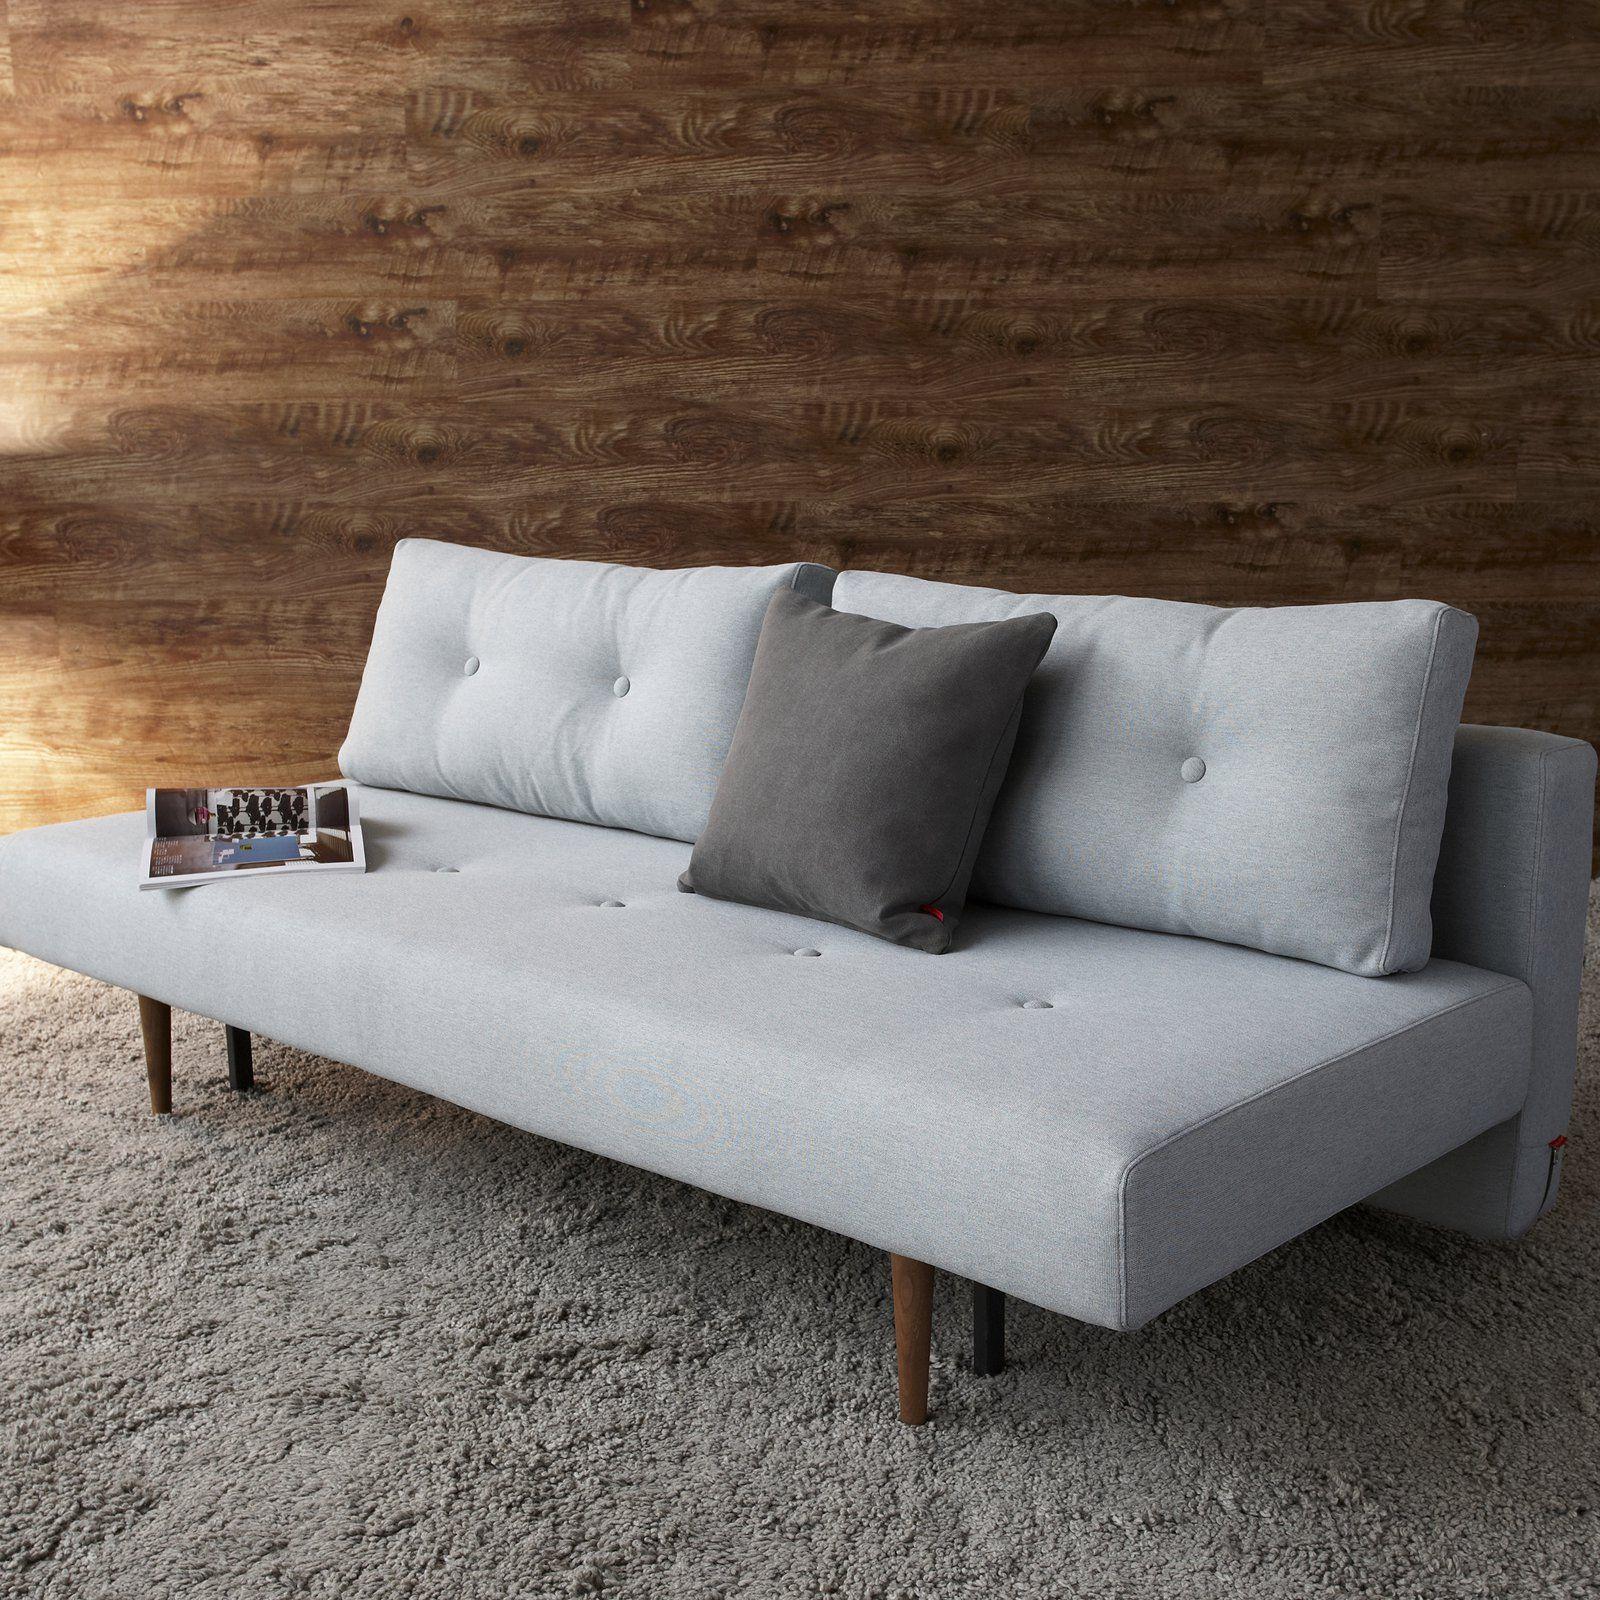 Innovation Living Recast Convertible Sofa From Hayneedle Com